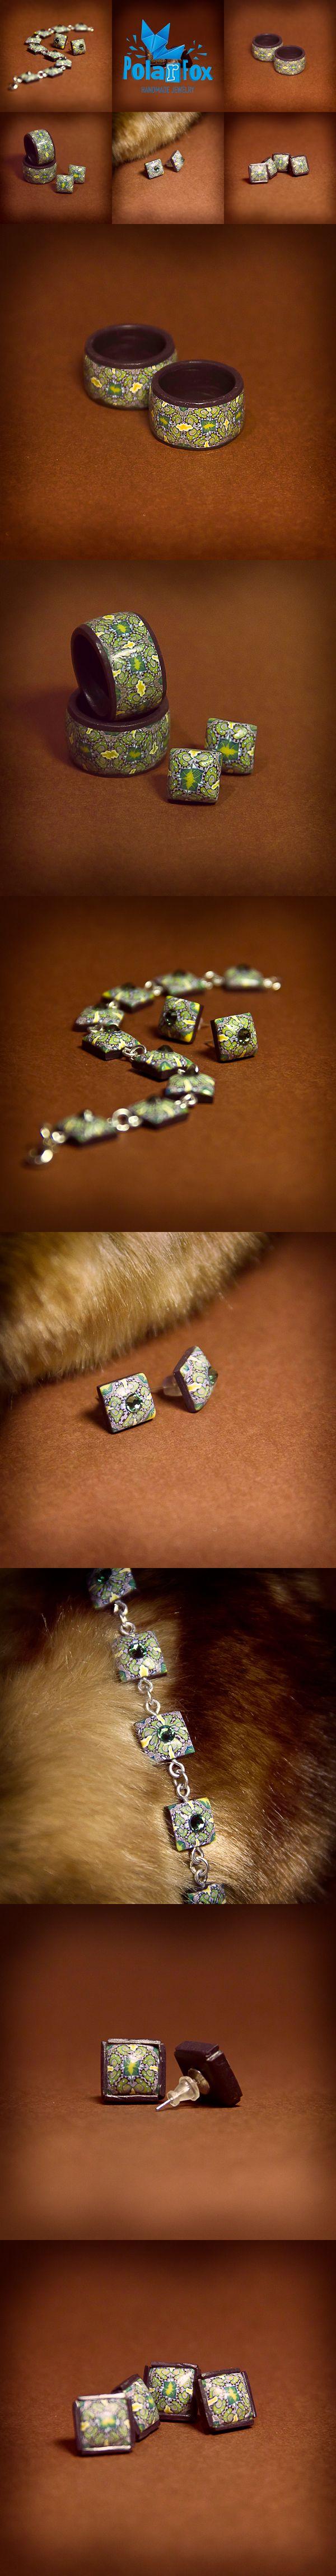 polymerclay, fimo, beads, kaleidoscope, cane, green, ring, earrings, bracelet, handmade, jewelry, hobby, polarfoxcraft